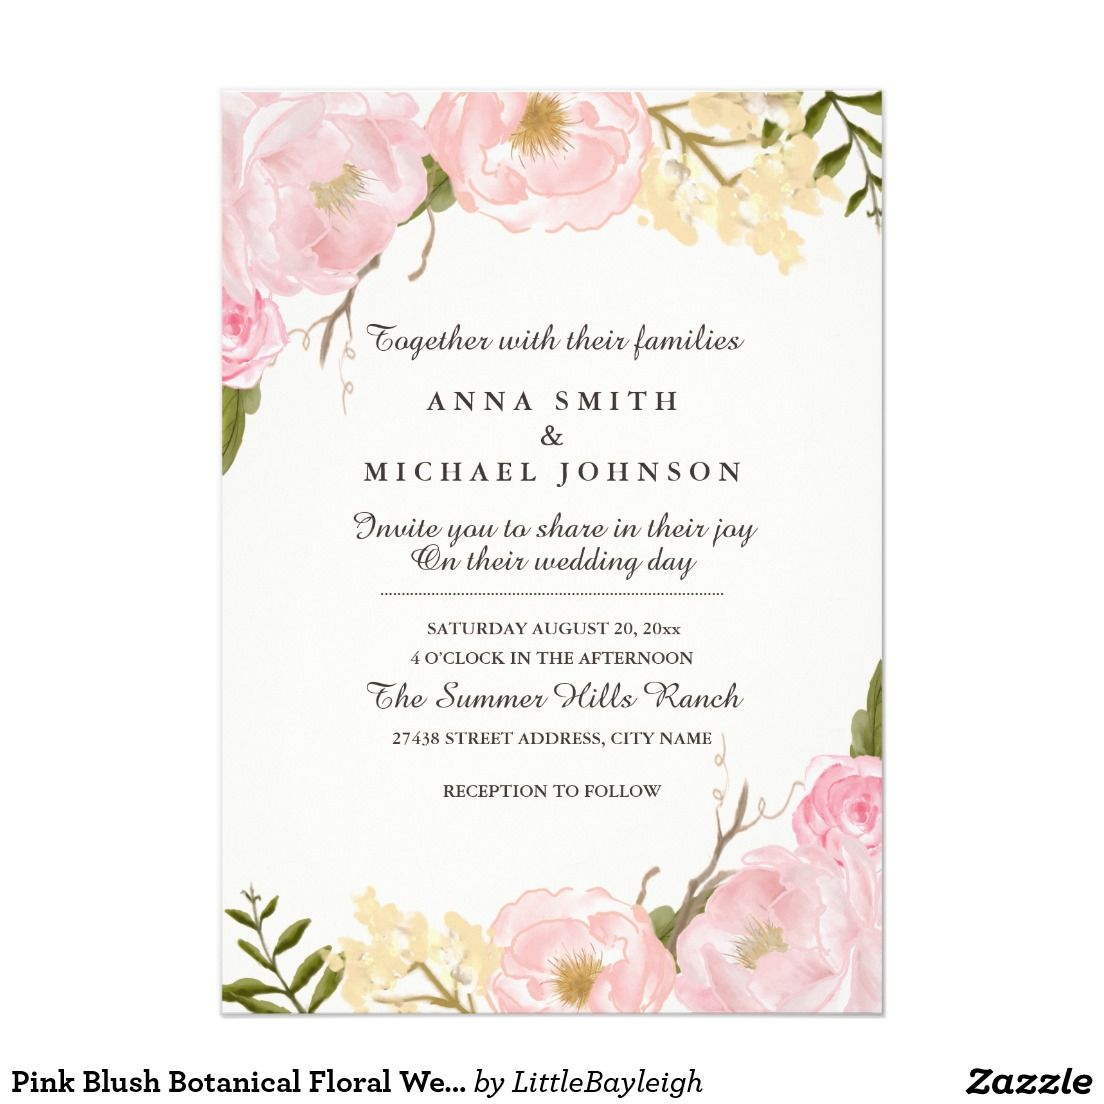 Pink Blush Botanical Floral Wedding Invitation   Floral wedding and ...